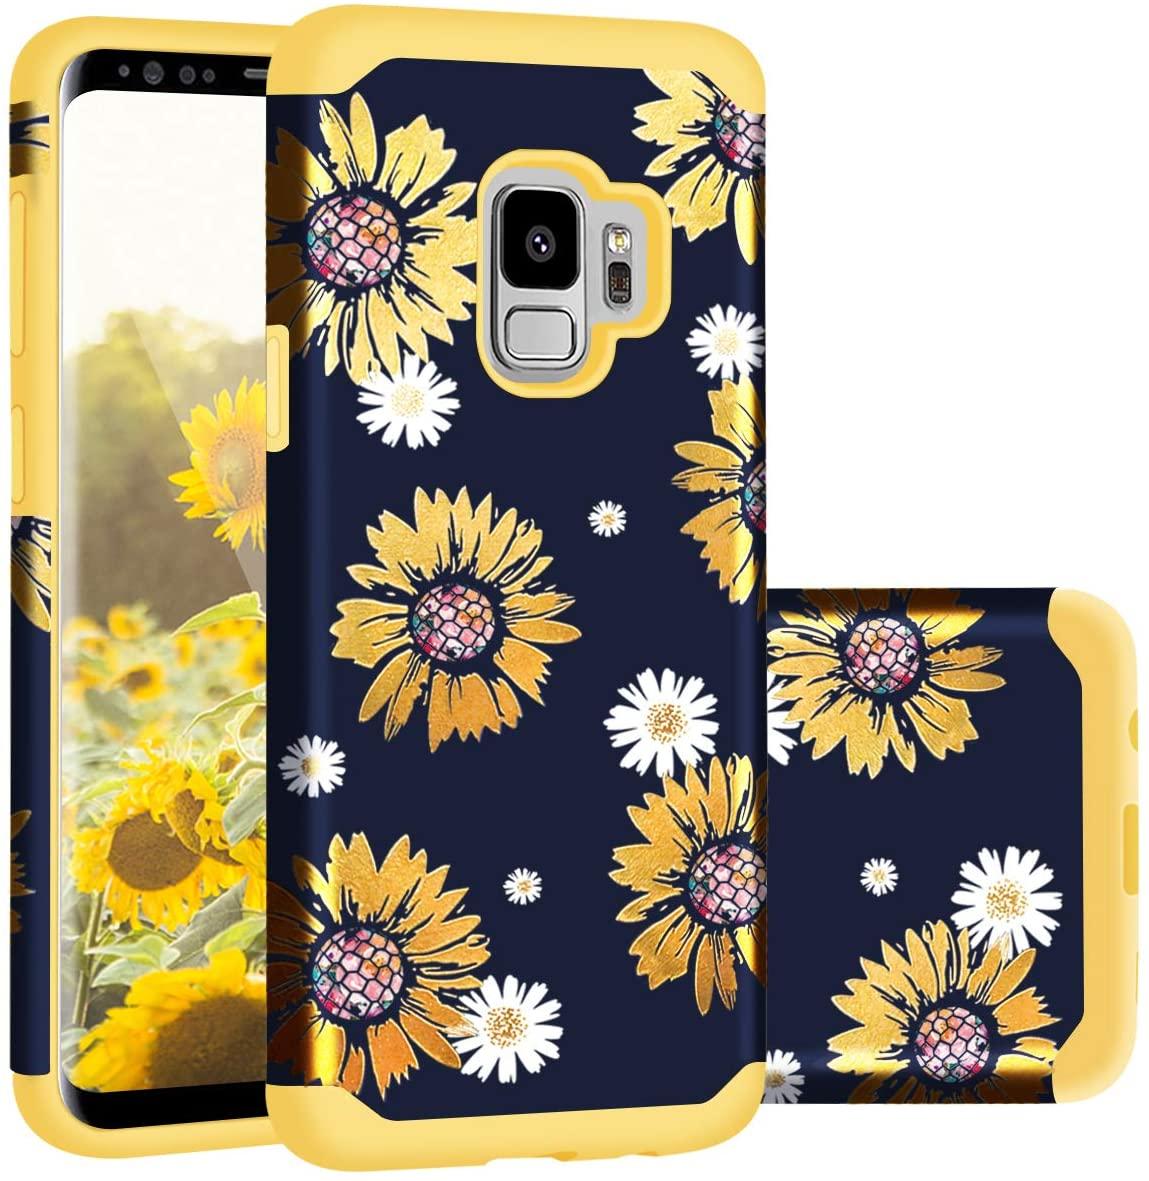 Casewind Galaxy S9 Case,Samsung S9 Case, Samsung Galaxy S9 Case Sunflower Glitter Slim Hard PC Soft Silicone Hybrid Protection Shockproof Anti Scratch Bumper Cover Galaxy S9 Case Girls,Yellow